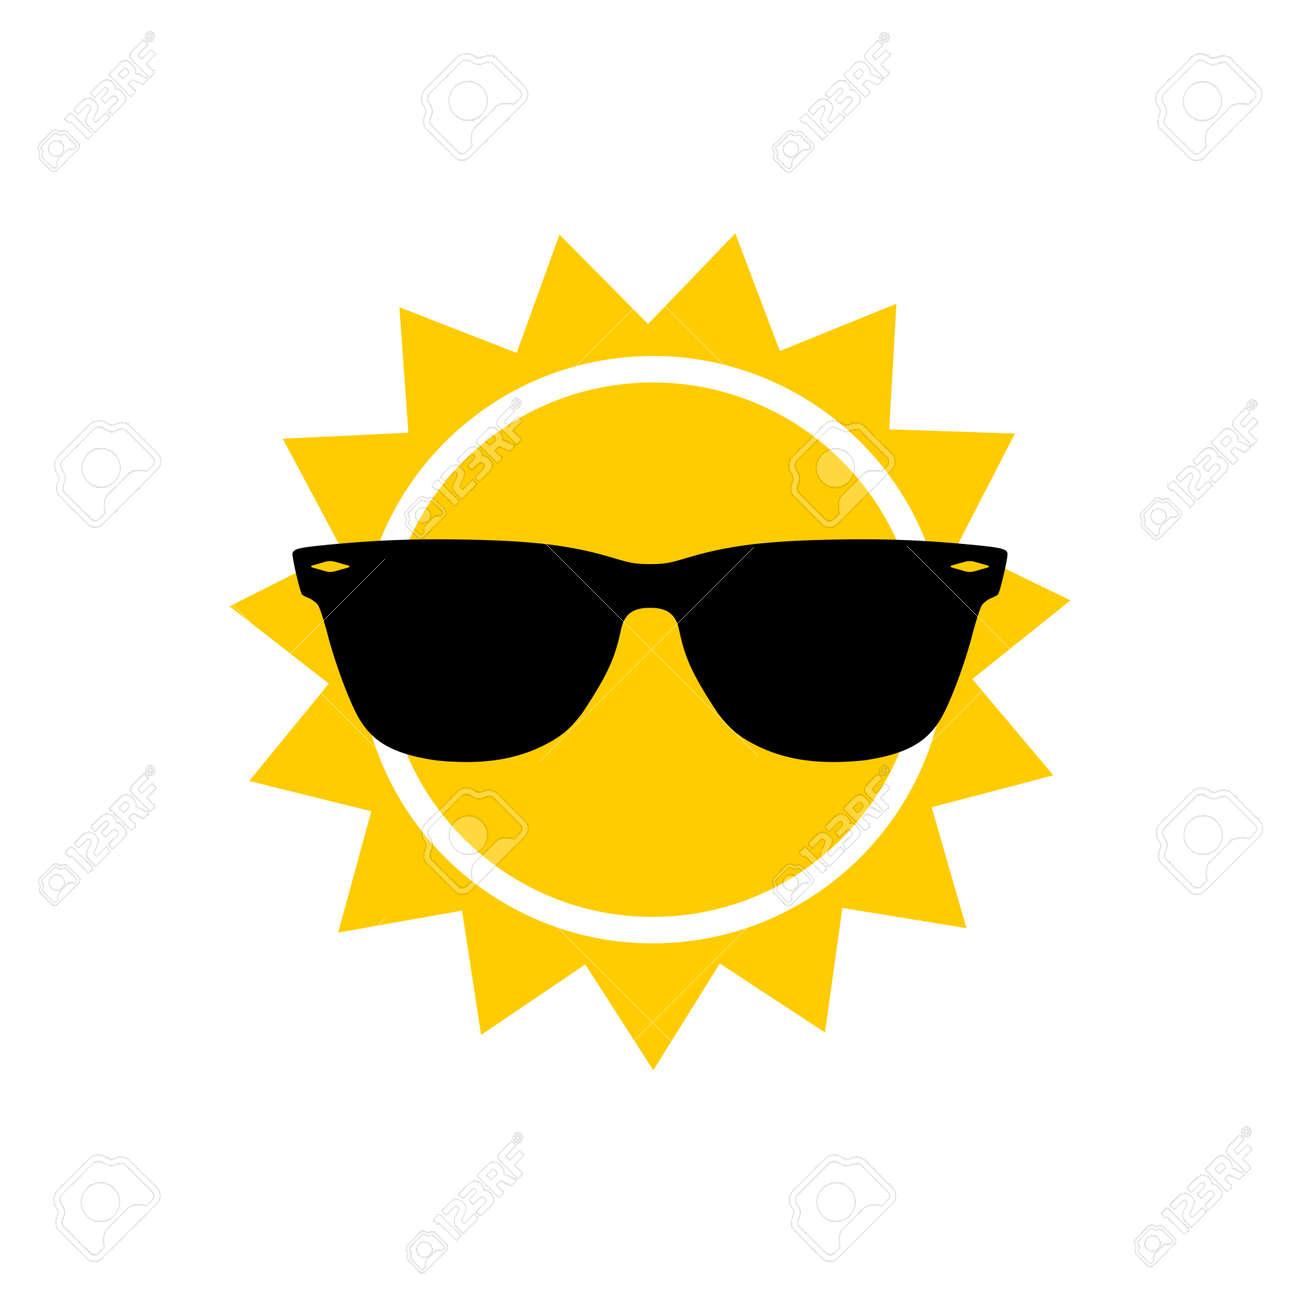 Sunglasses and sun icon, sign or logo - 159406224